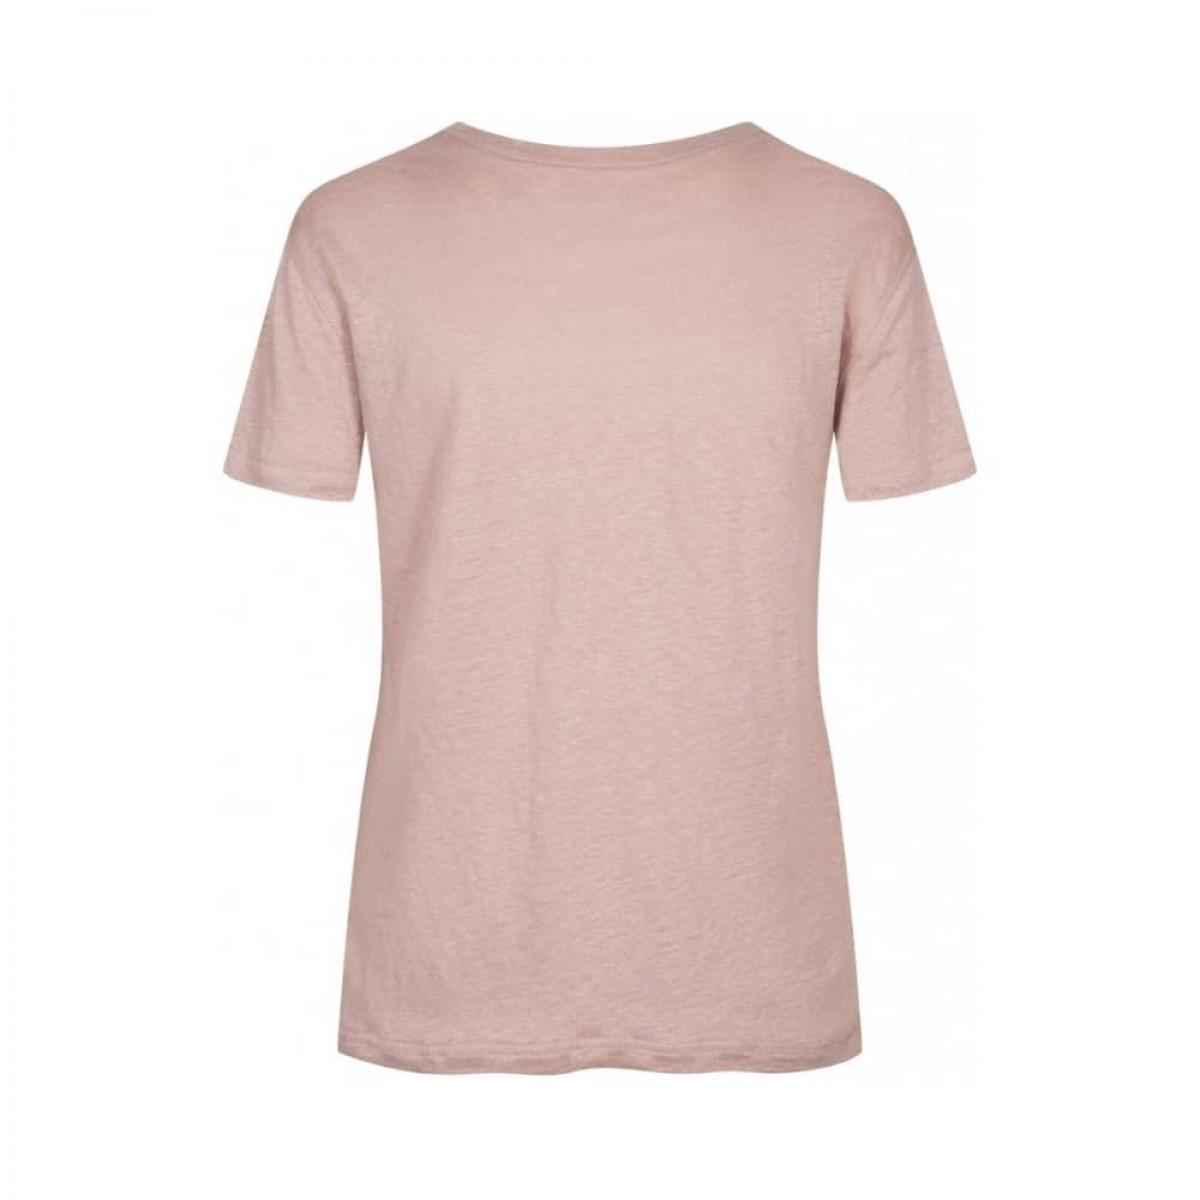 sif v-hals t-shirt - lavender - ryggen